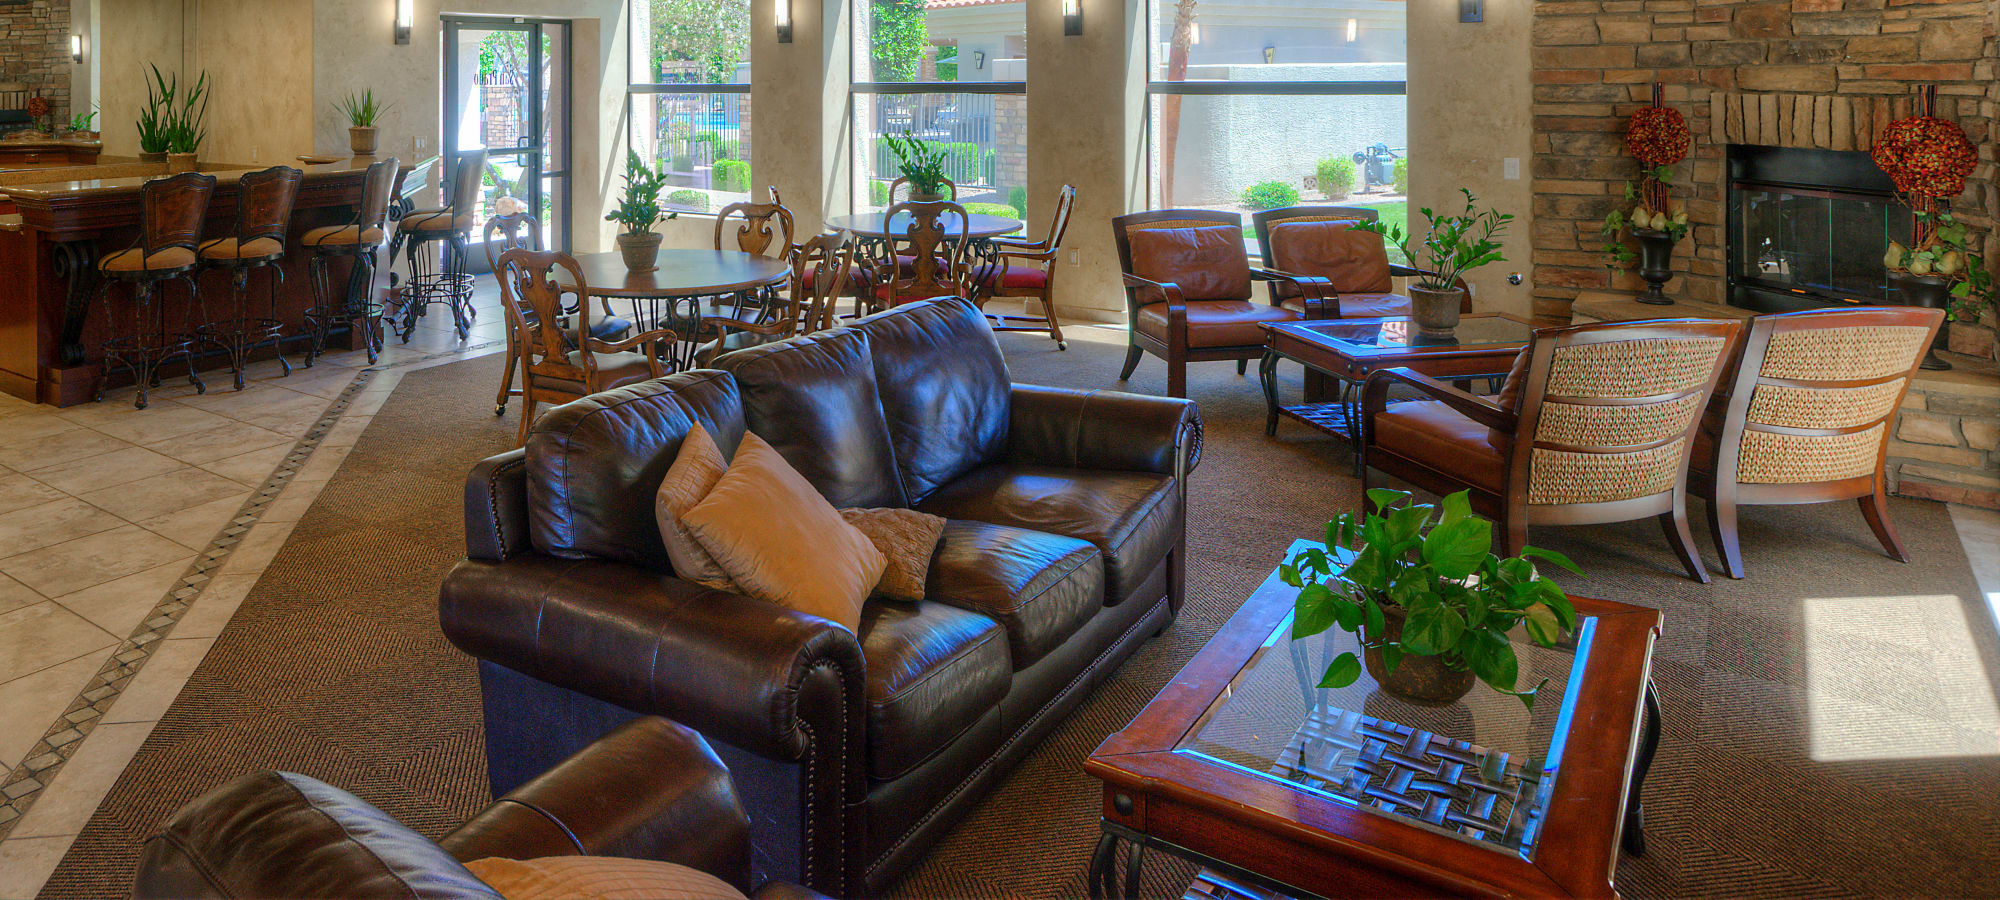 Social lounge in the clubhouse at San Prado in Glendale, Arizona